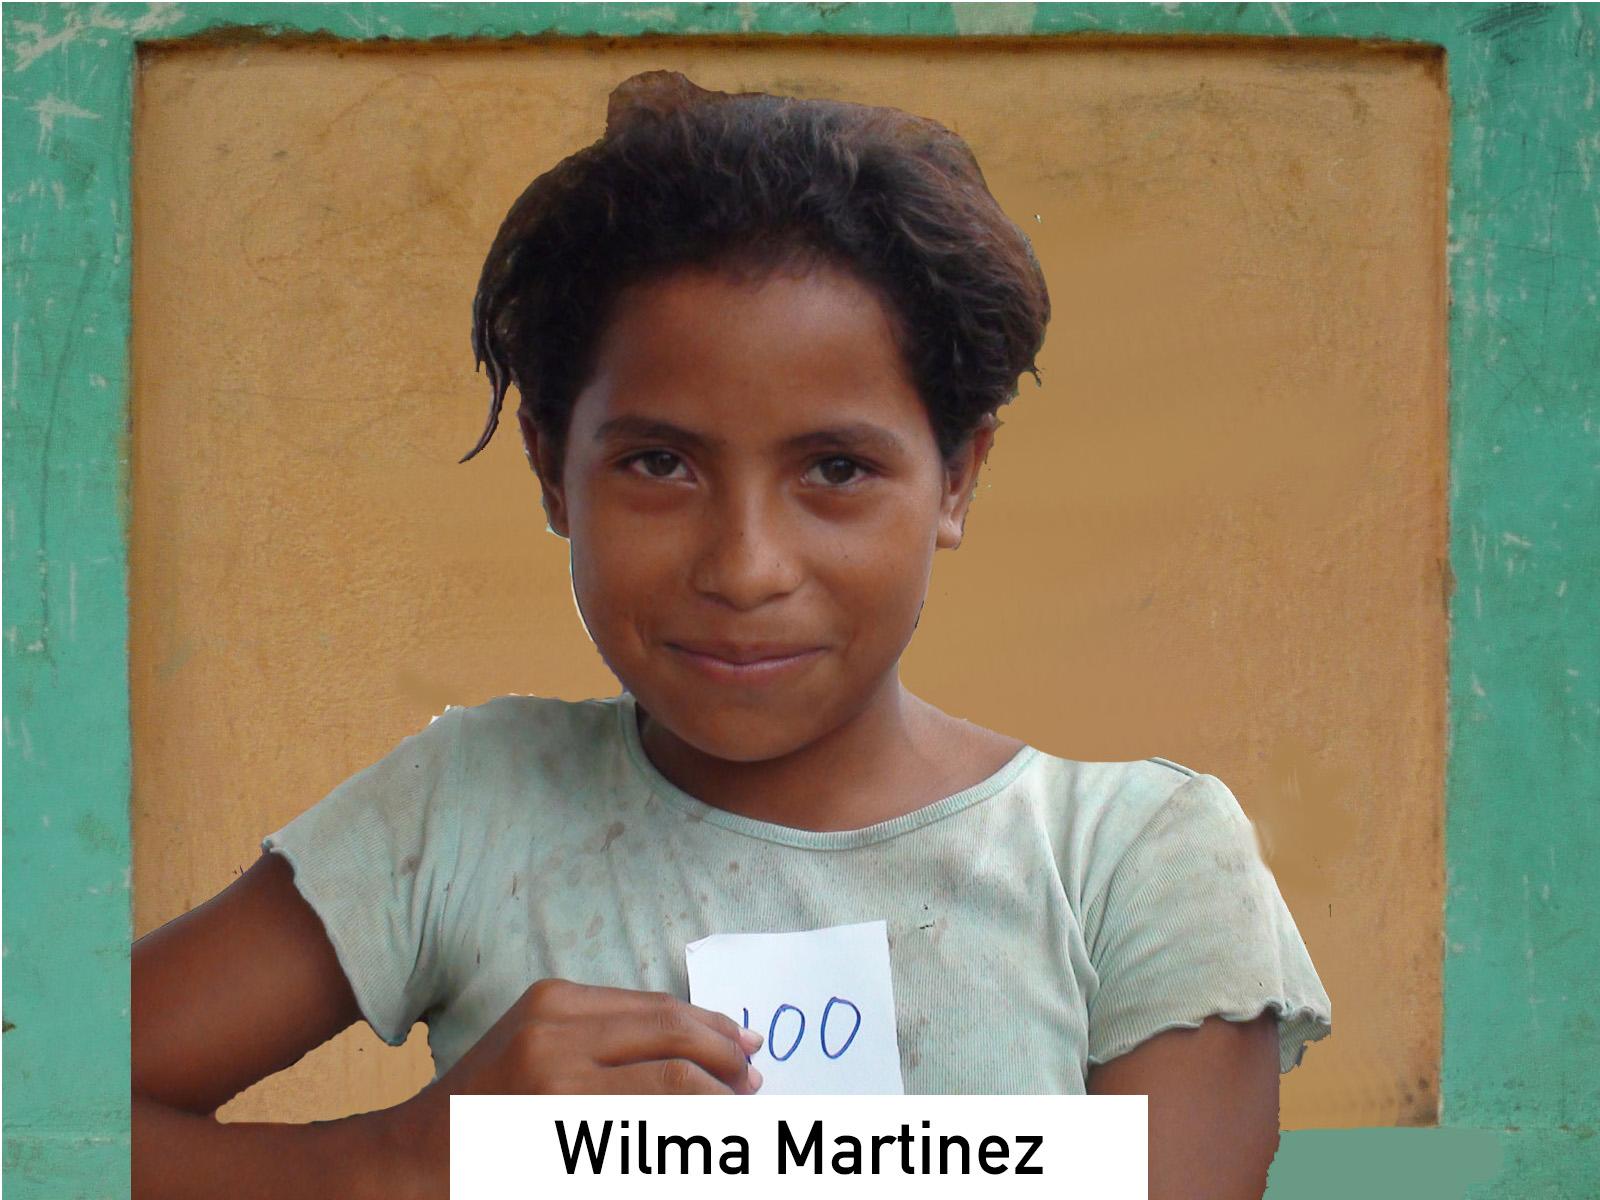 100 - Wilma Martinez.jpg